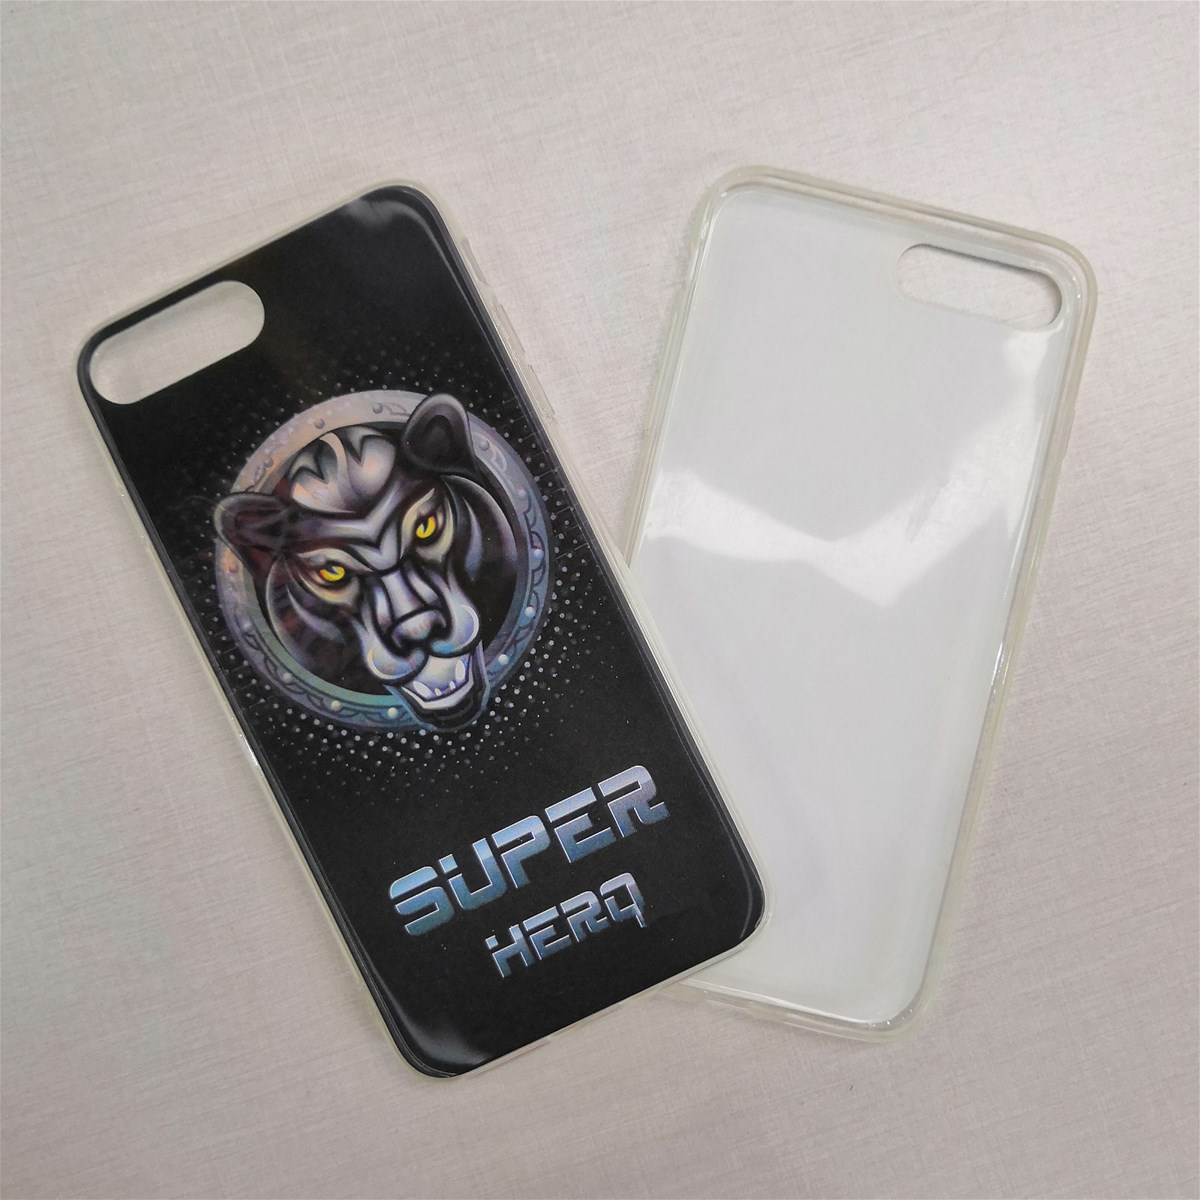 3D lenticular printing phone cases